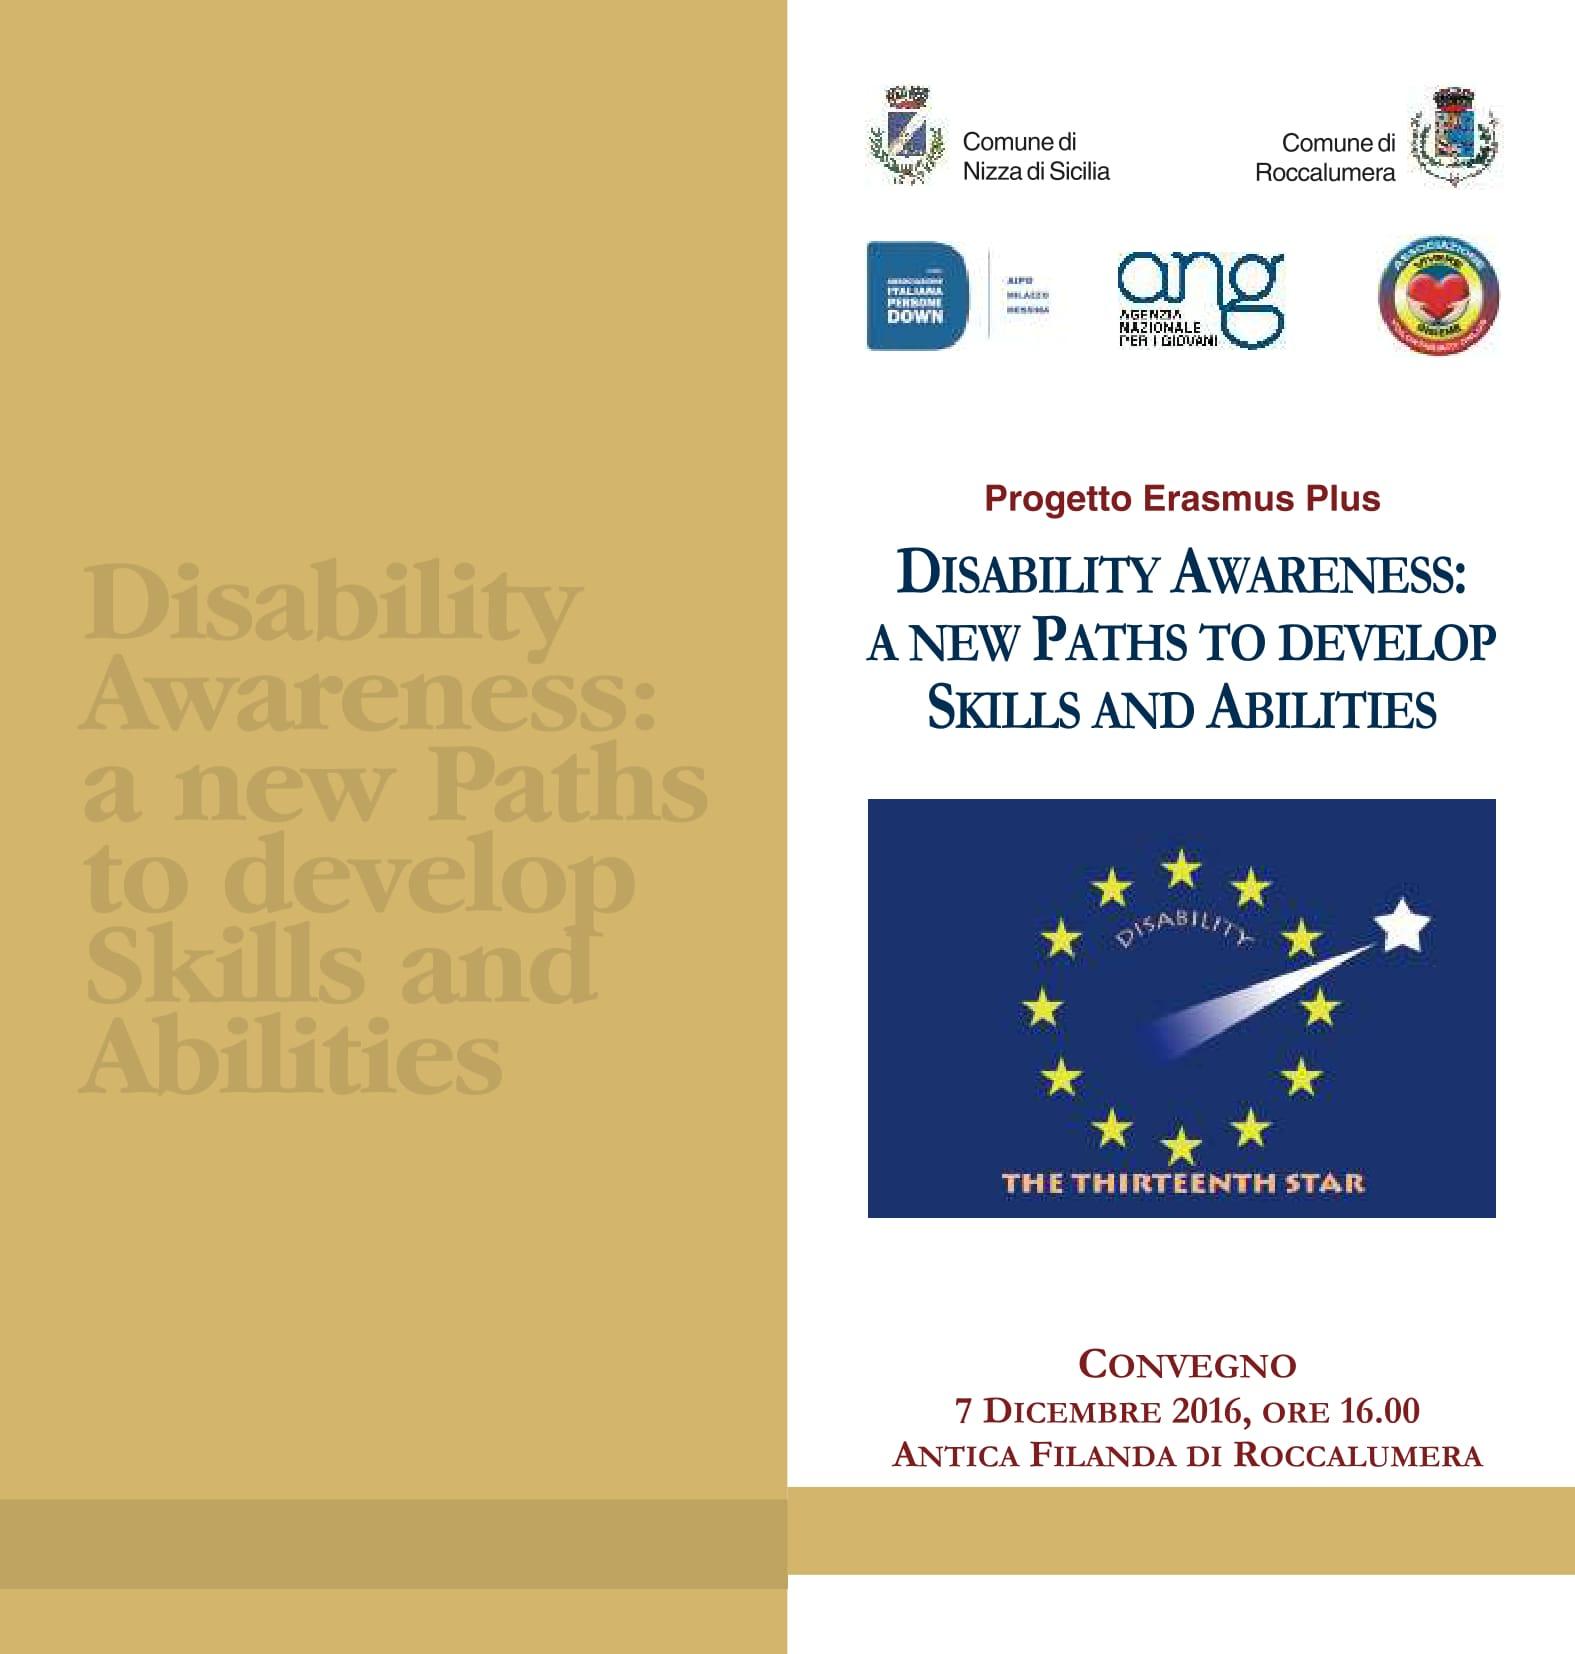 invito-disability-awareness-1-1